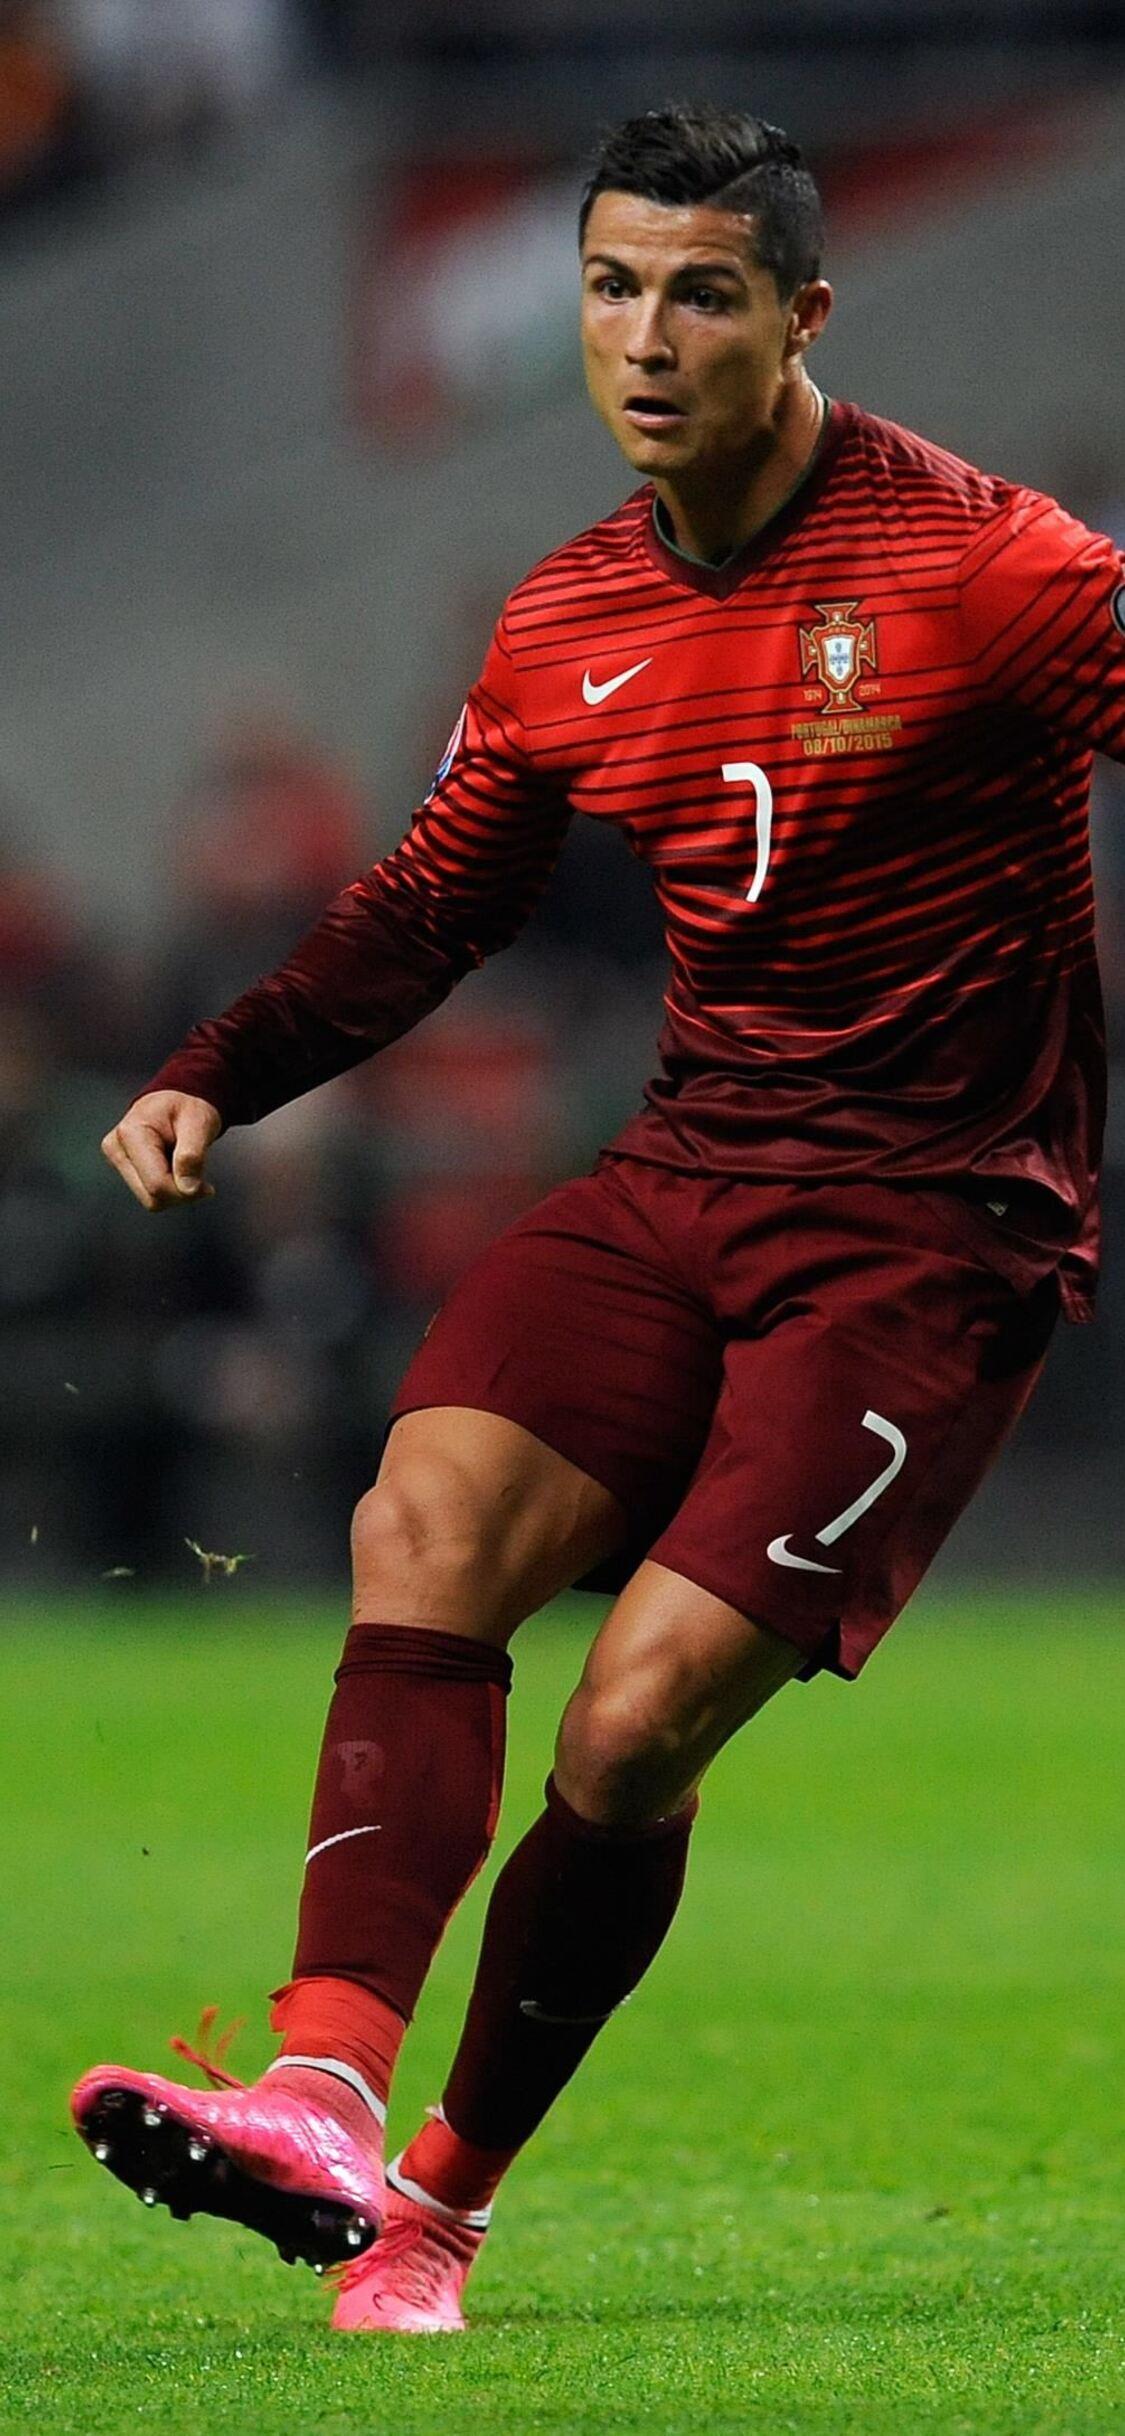 1125x2436 Cristiano Ronaldo Iphone XS,Iphone 10,Iphone X ...